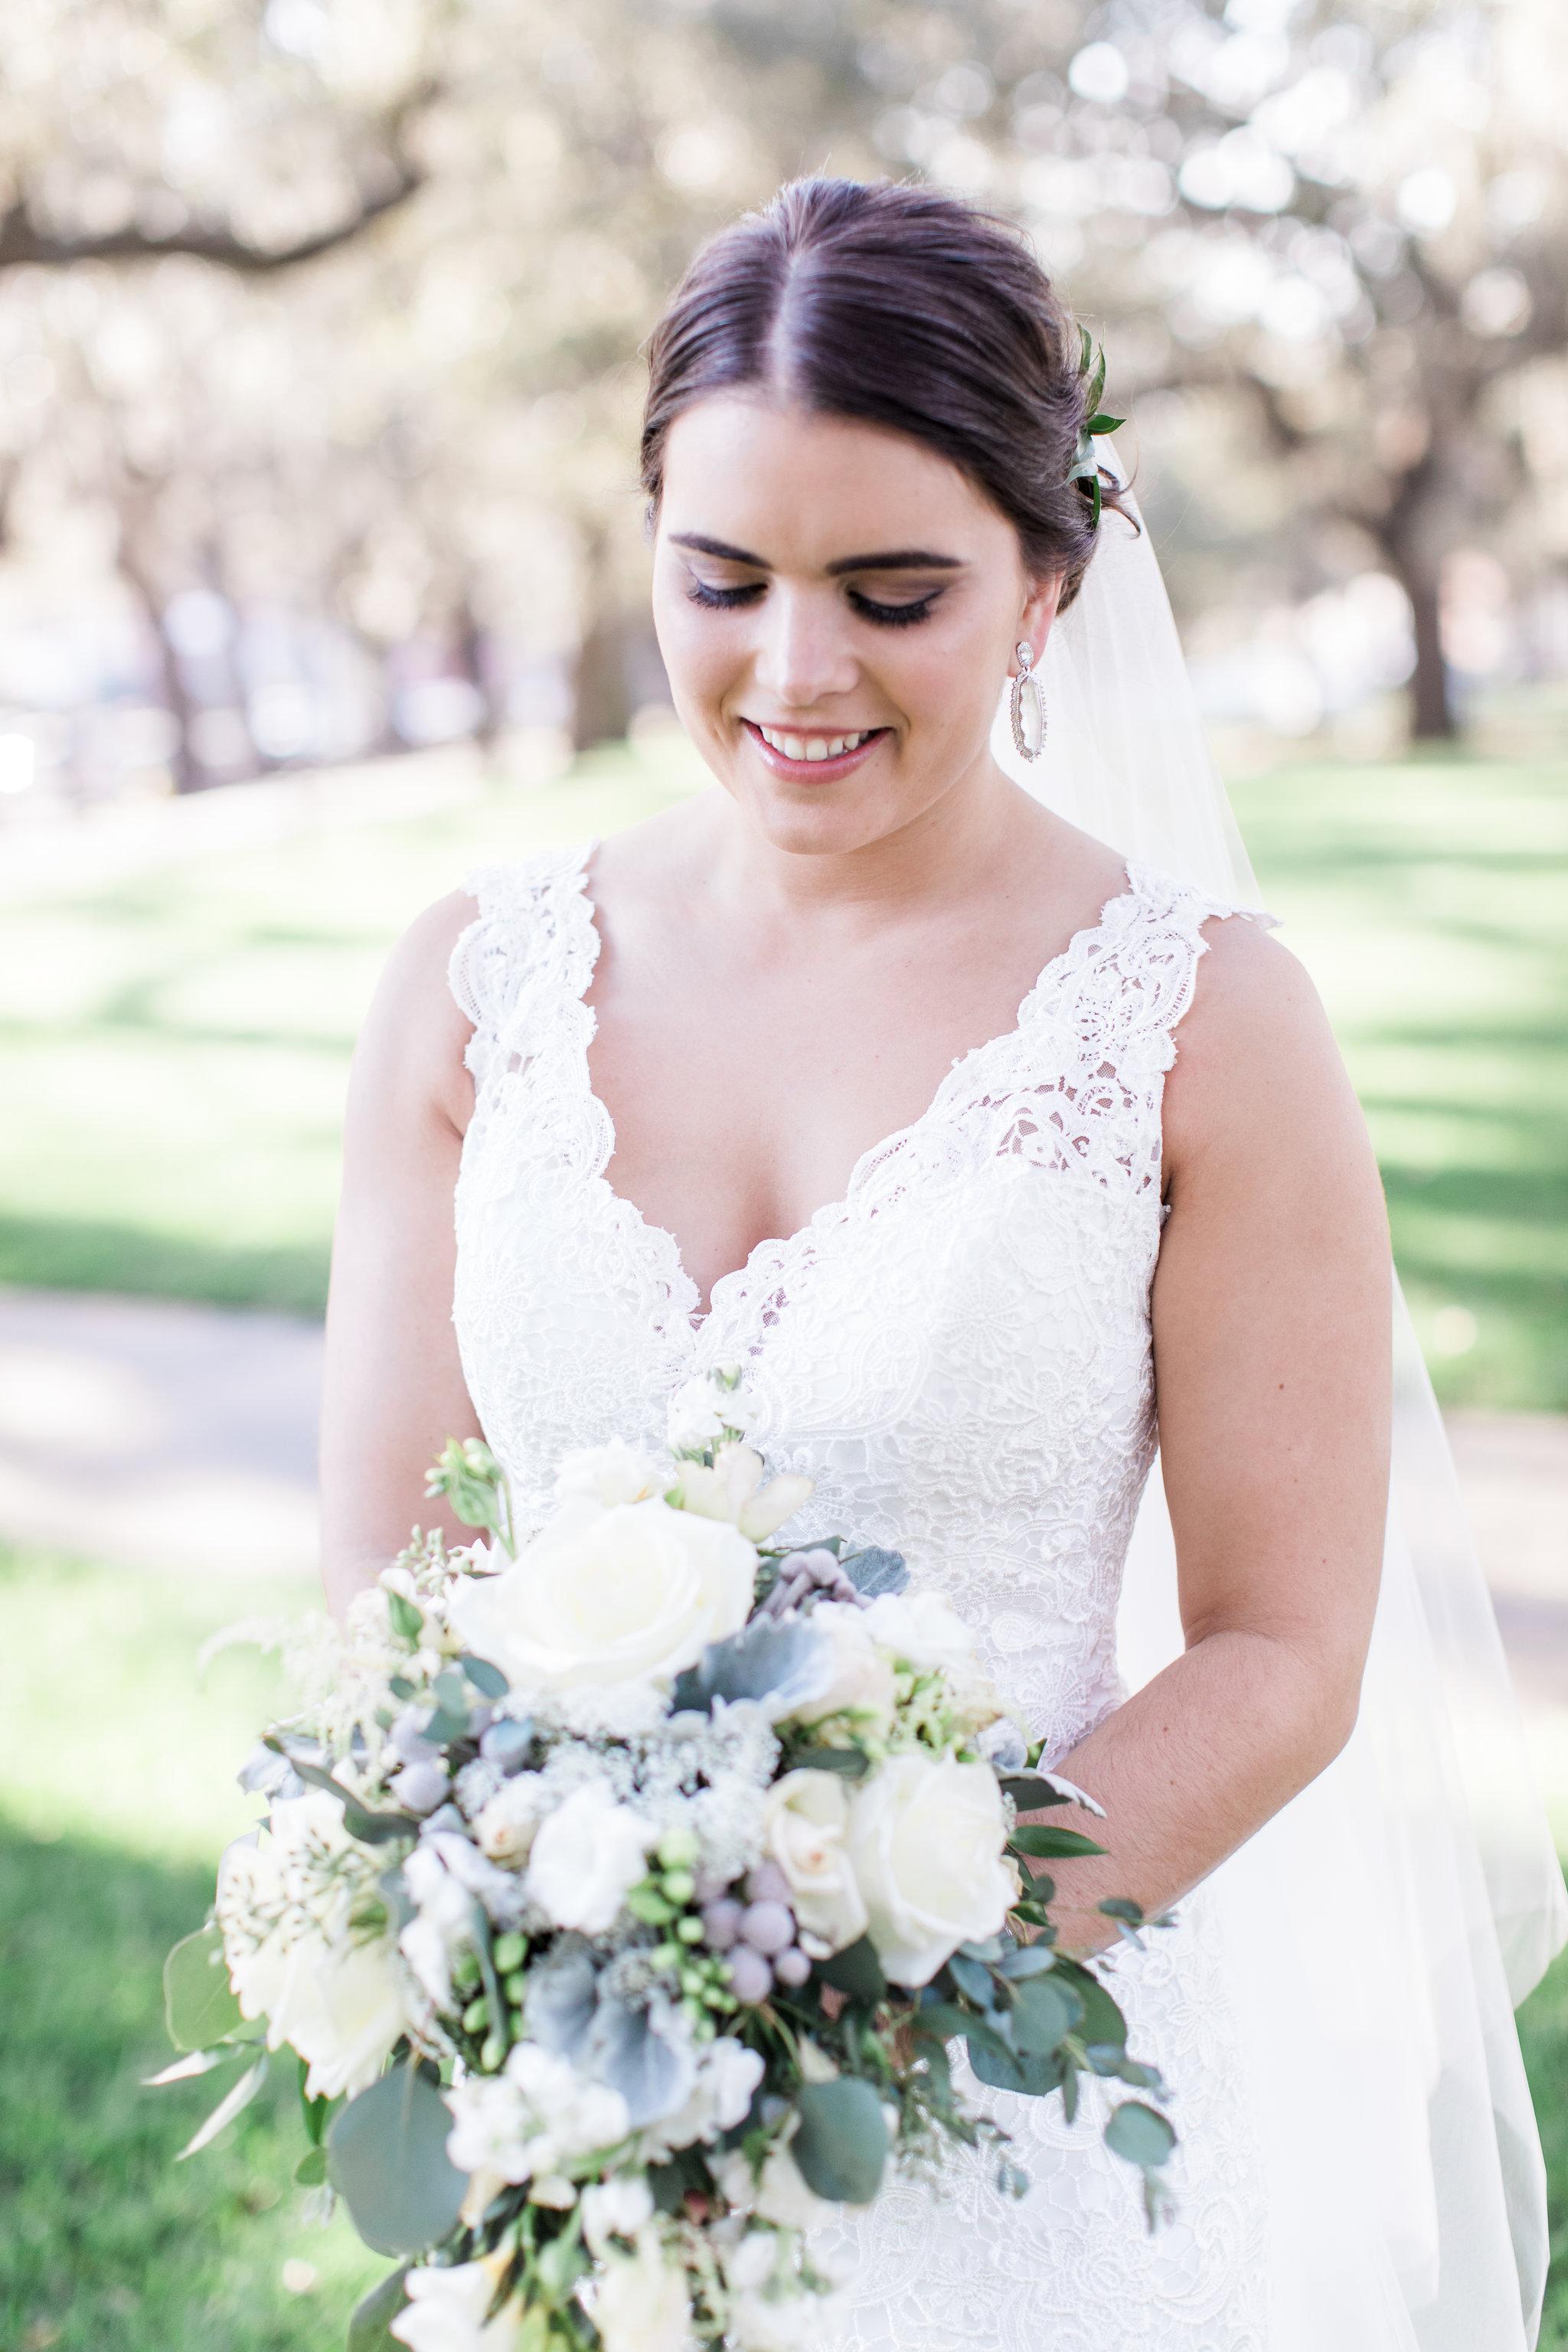 apt-b-photography-Savannah-wedding-photographer-savannah-engagement-photographer-historic-savannah-engagement-charles-h-morris-center-wedding-savannah-weddings-21.JPG